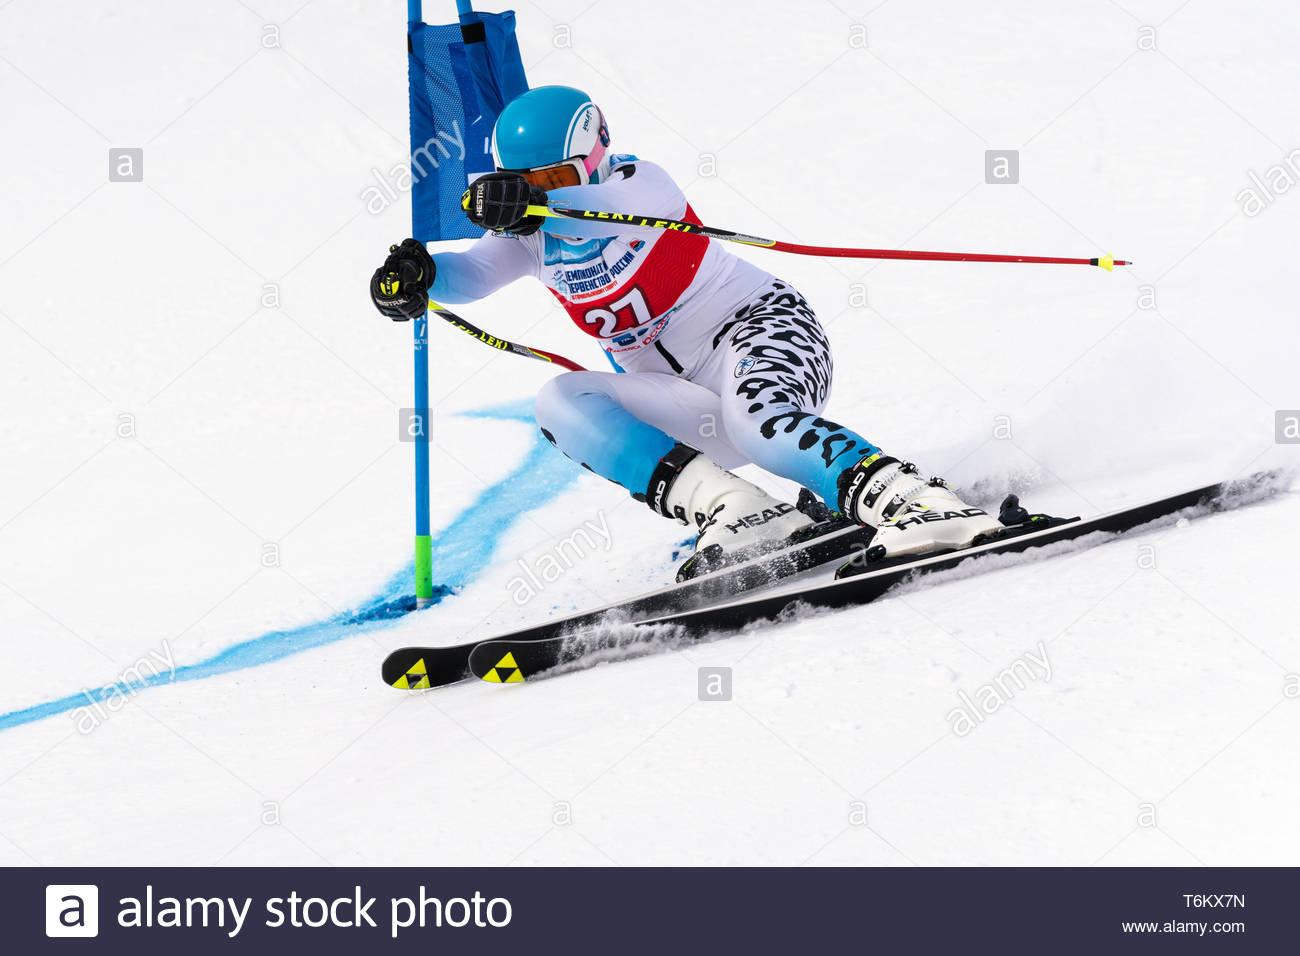 KAMCHATKA, RUSSIA - APR 2, 2019: International Ski Federation Championship, Russian Women's Alpine Skiing Cup giant slalom. Mountain skier Veronika Ga - Stock Image